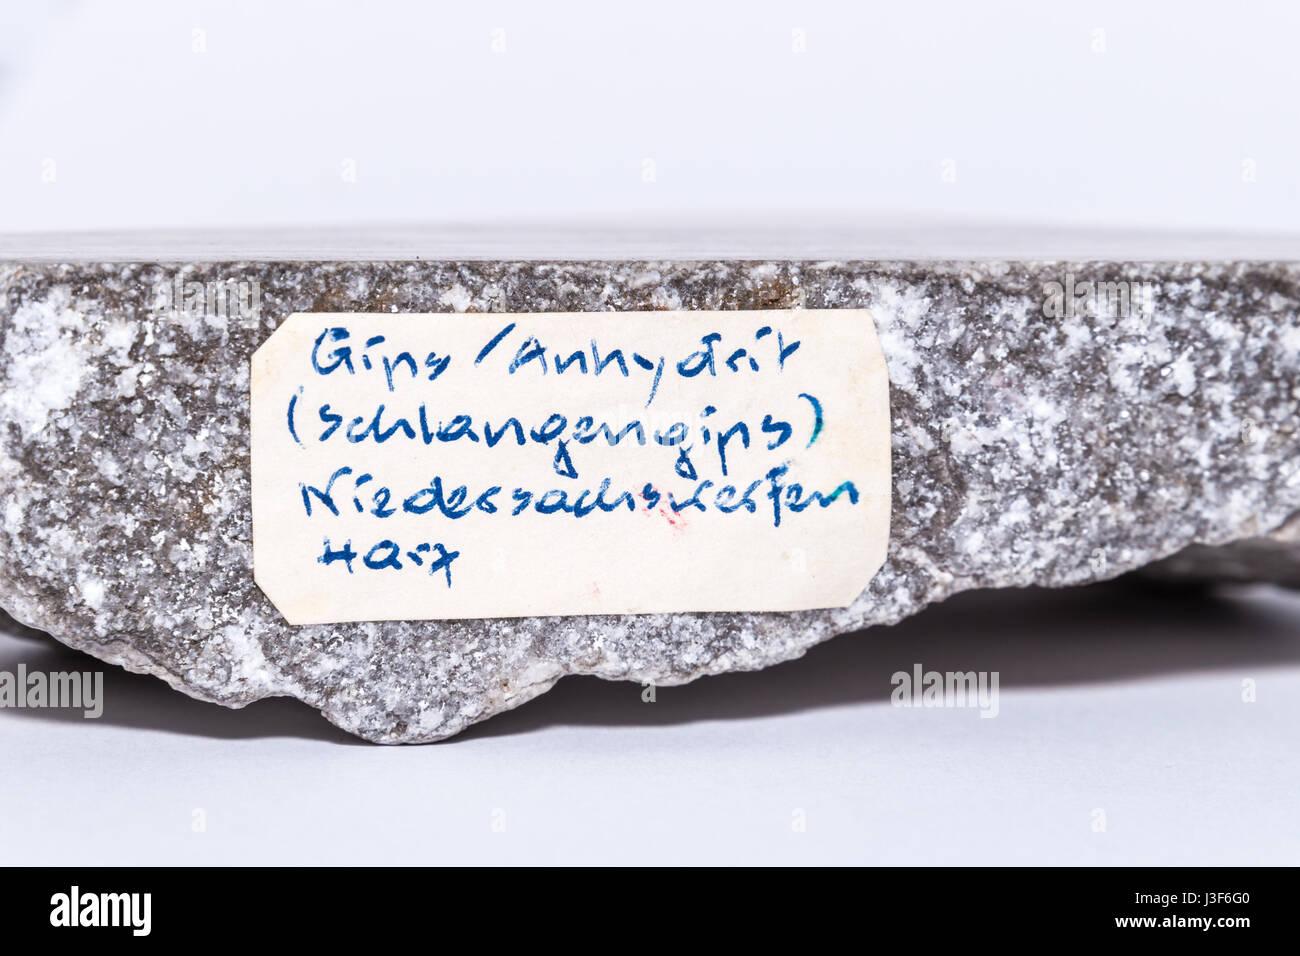 Grey and white gemstone gem jewel mineral precious stone caption 3 - Stock Image